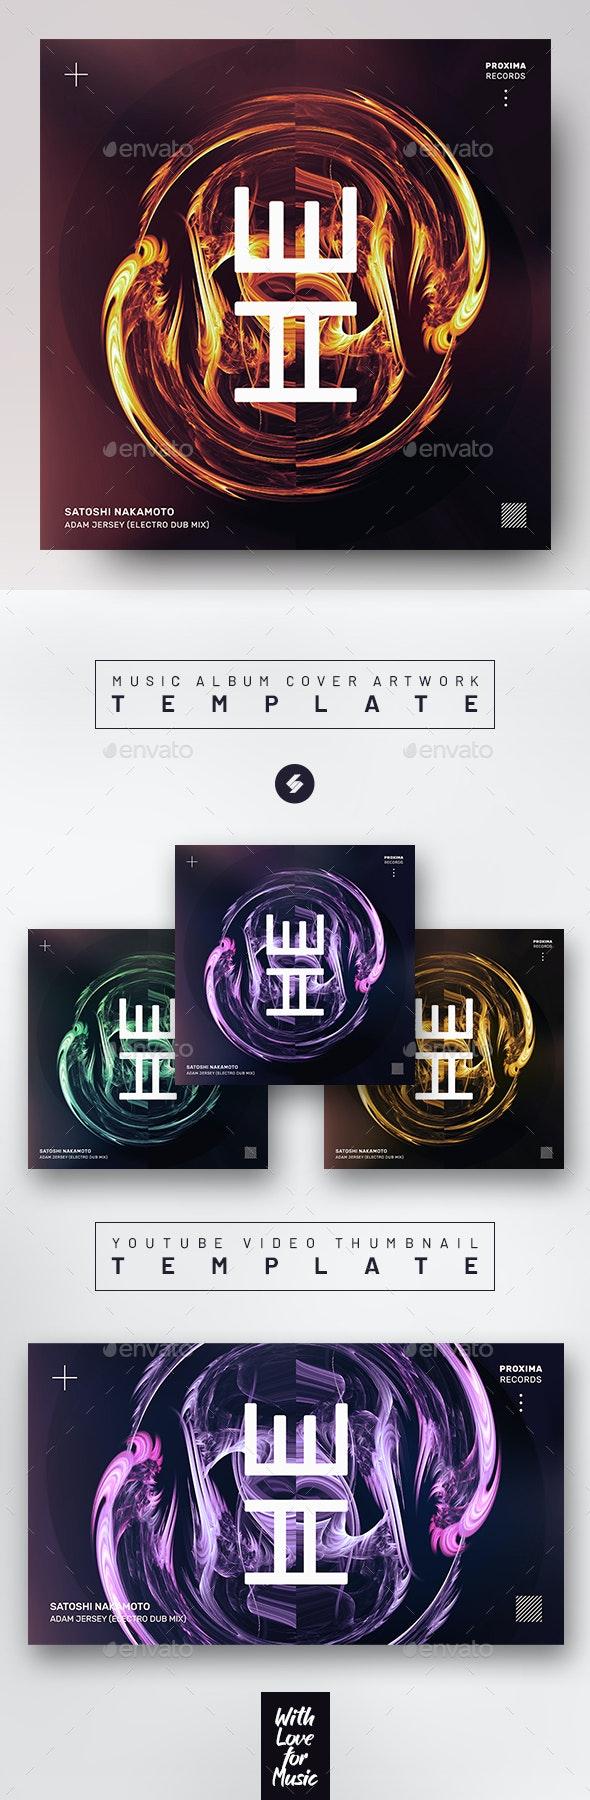 Electro Flame – Music Album Cover Artwork Template - Miscellaneous Social Media